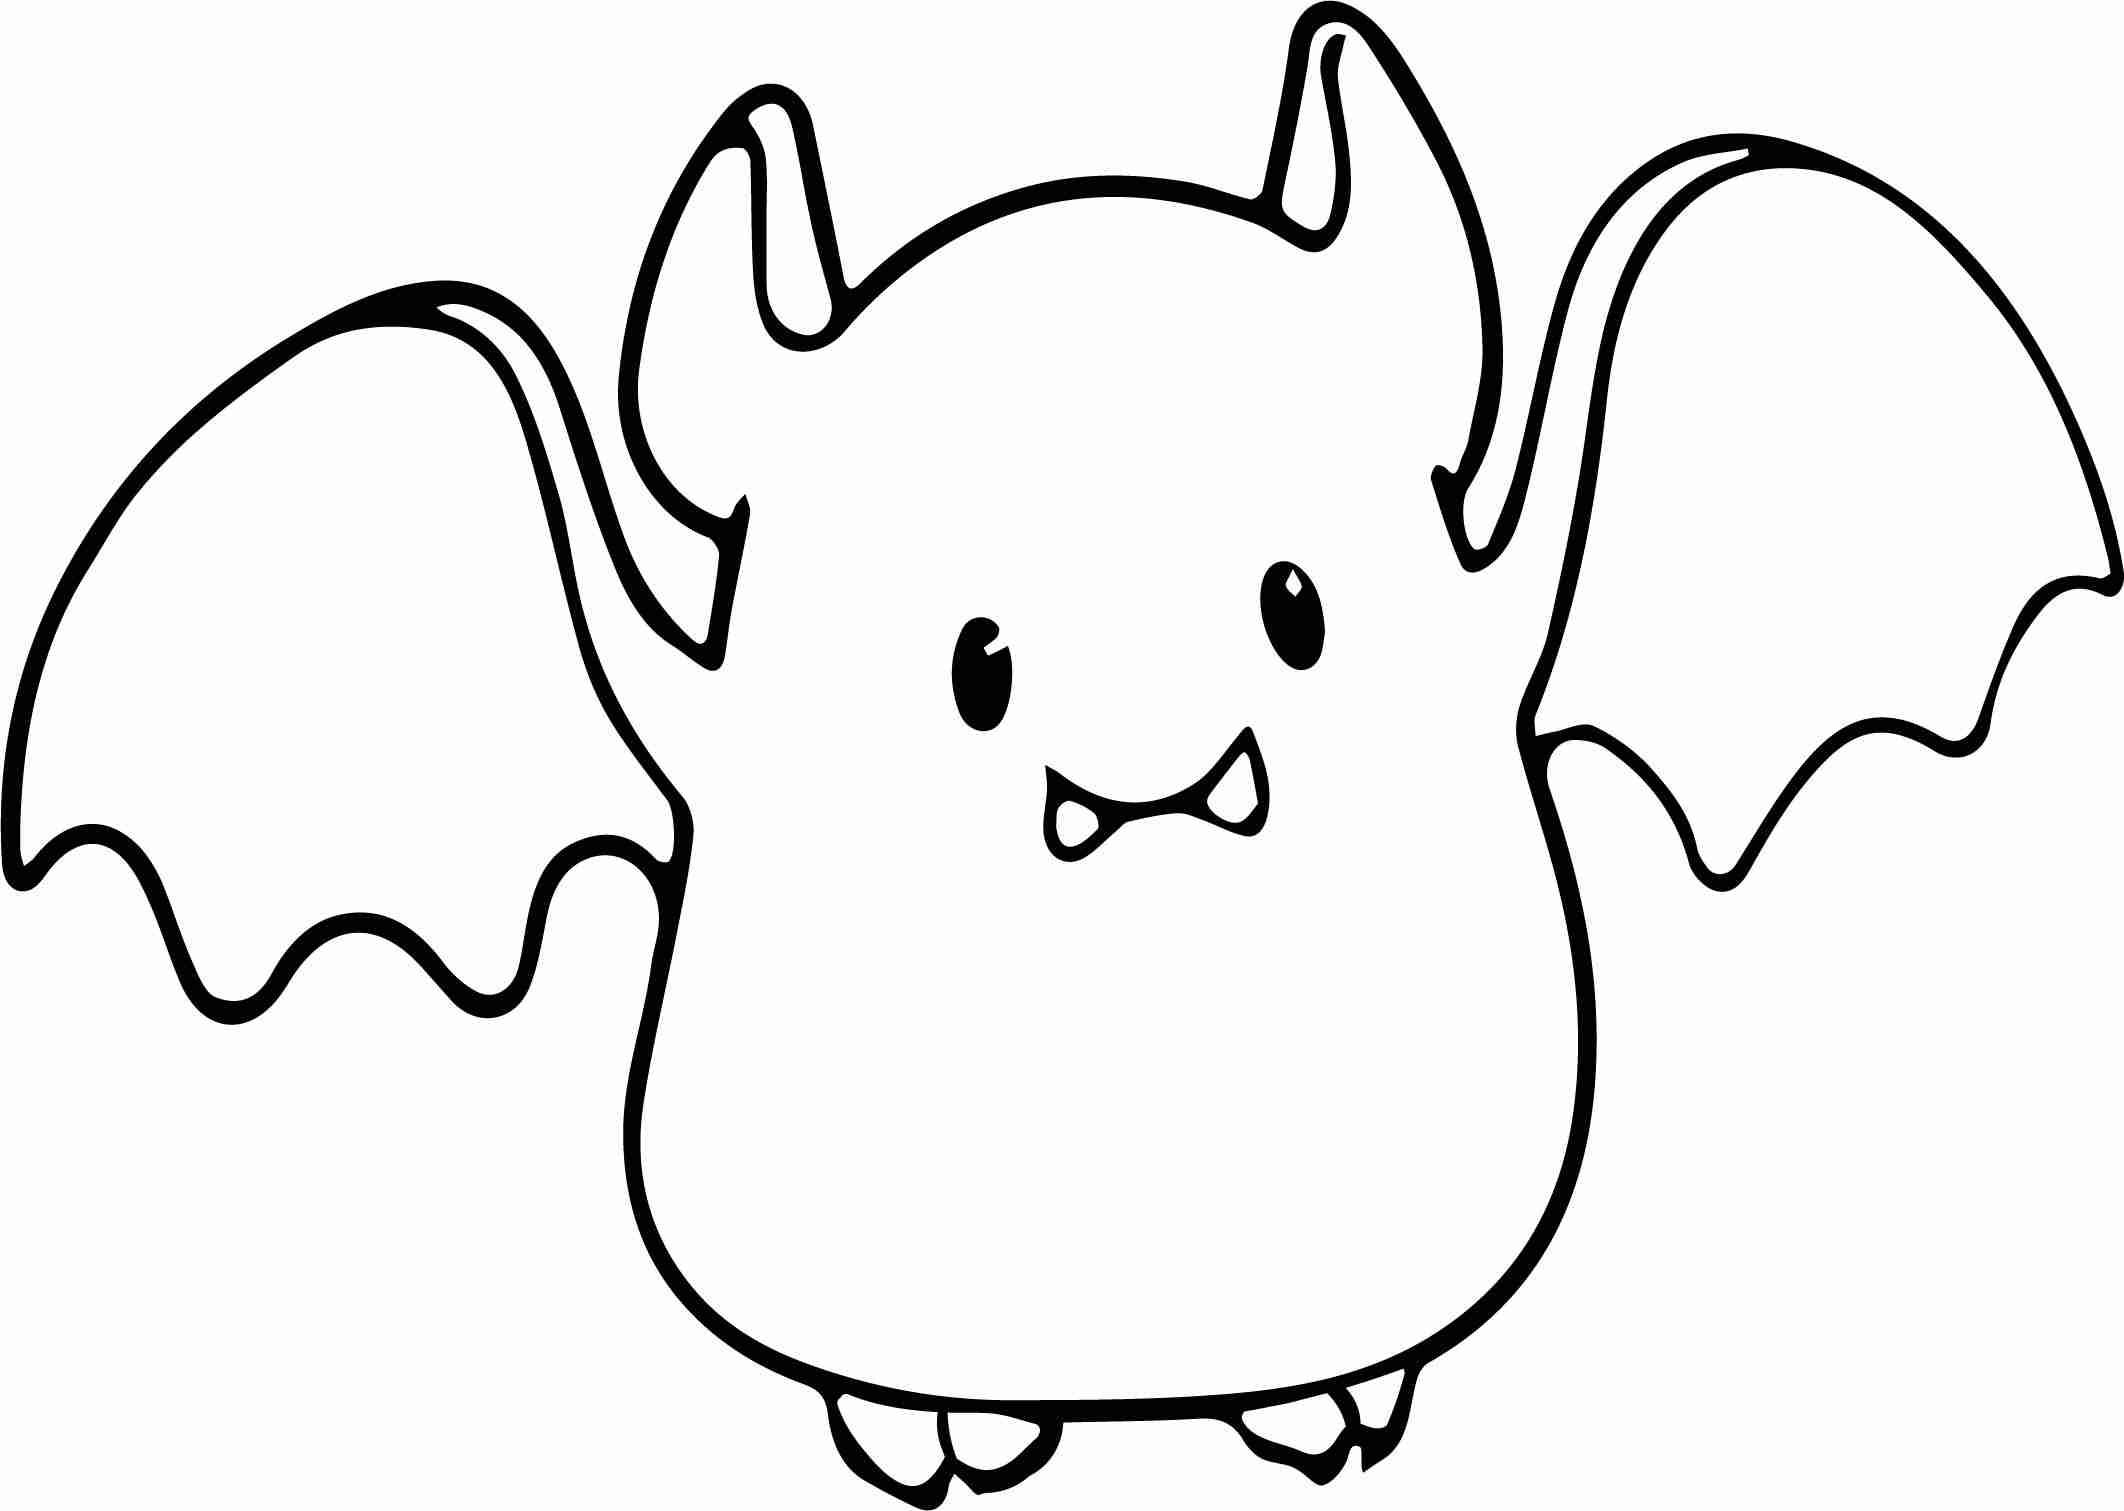 Vampire Bat Coloring Pages At Getcolorings